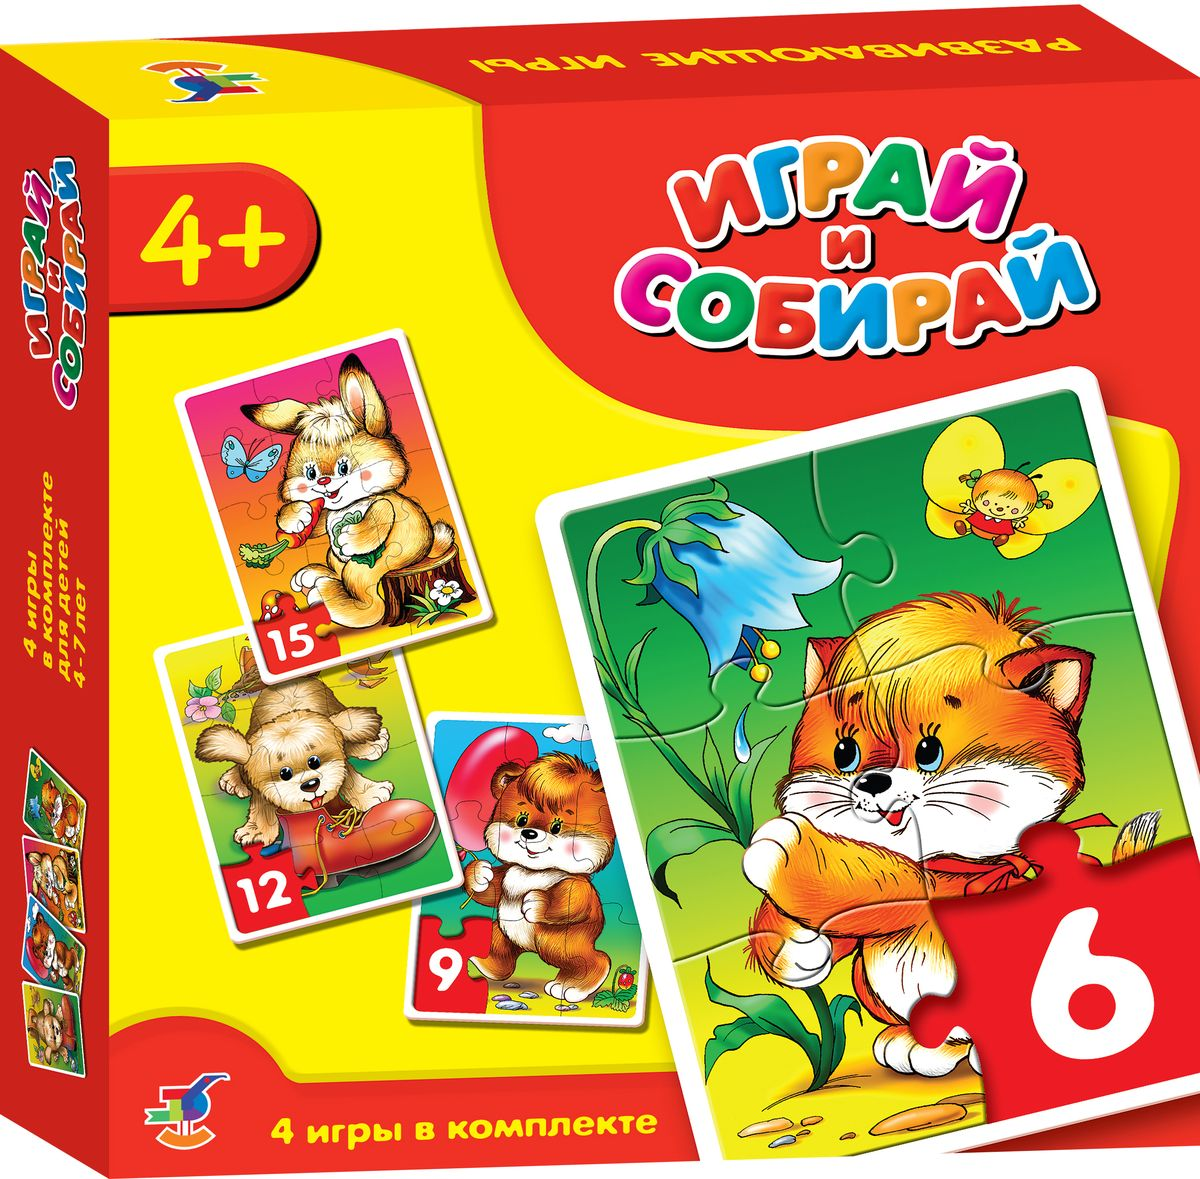 Дрофа-Медиа Пазл для малышей Играй и собирай 4 в 1 2938 дрофа медиа пазл для малышей играй и собирай 4 в 1 2938